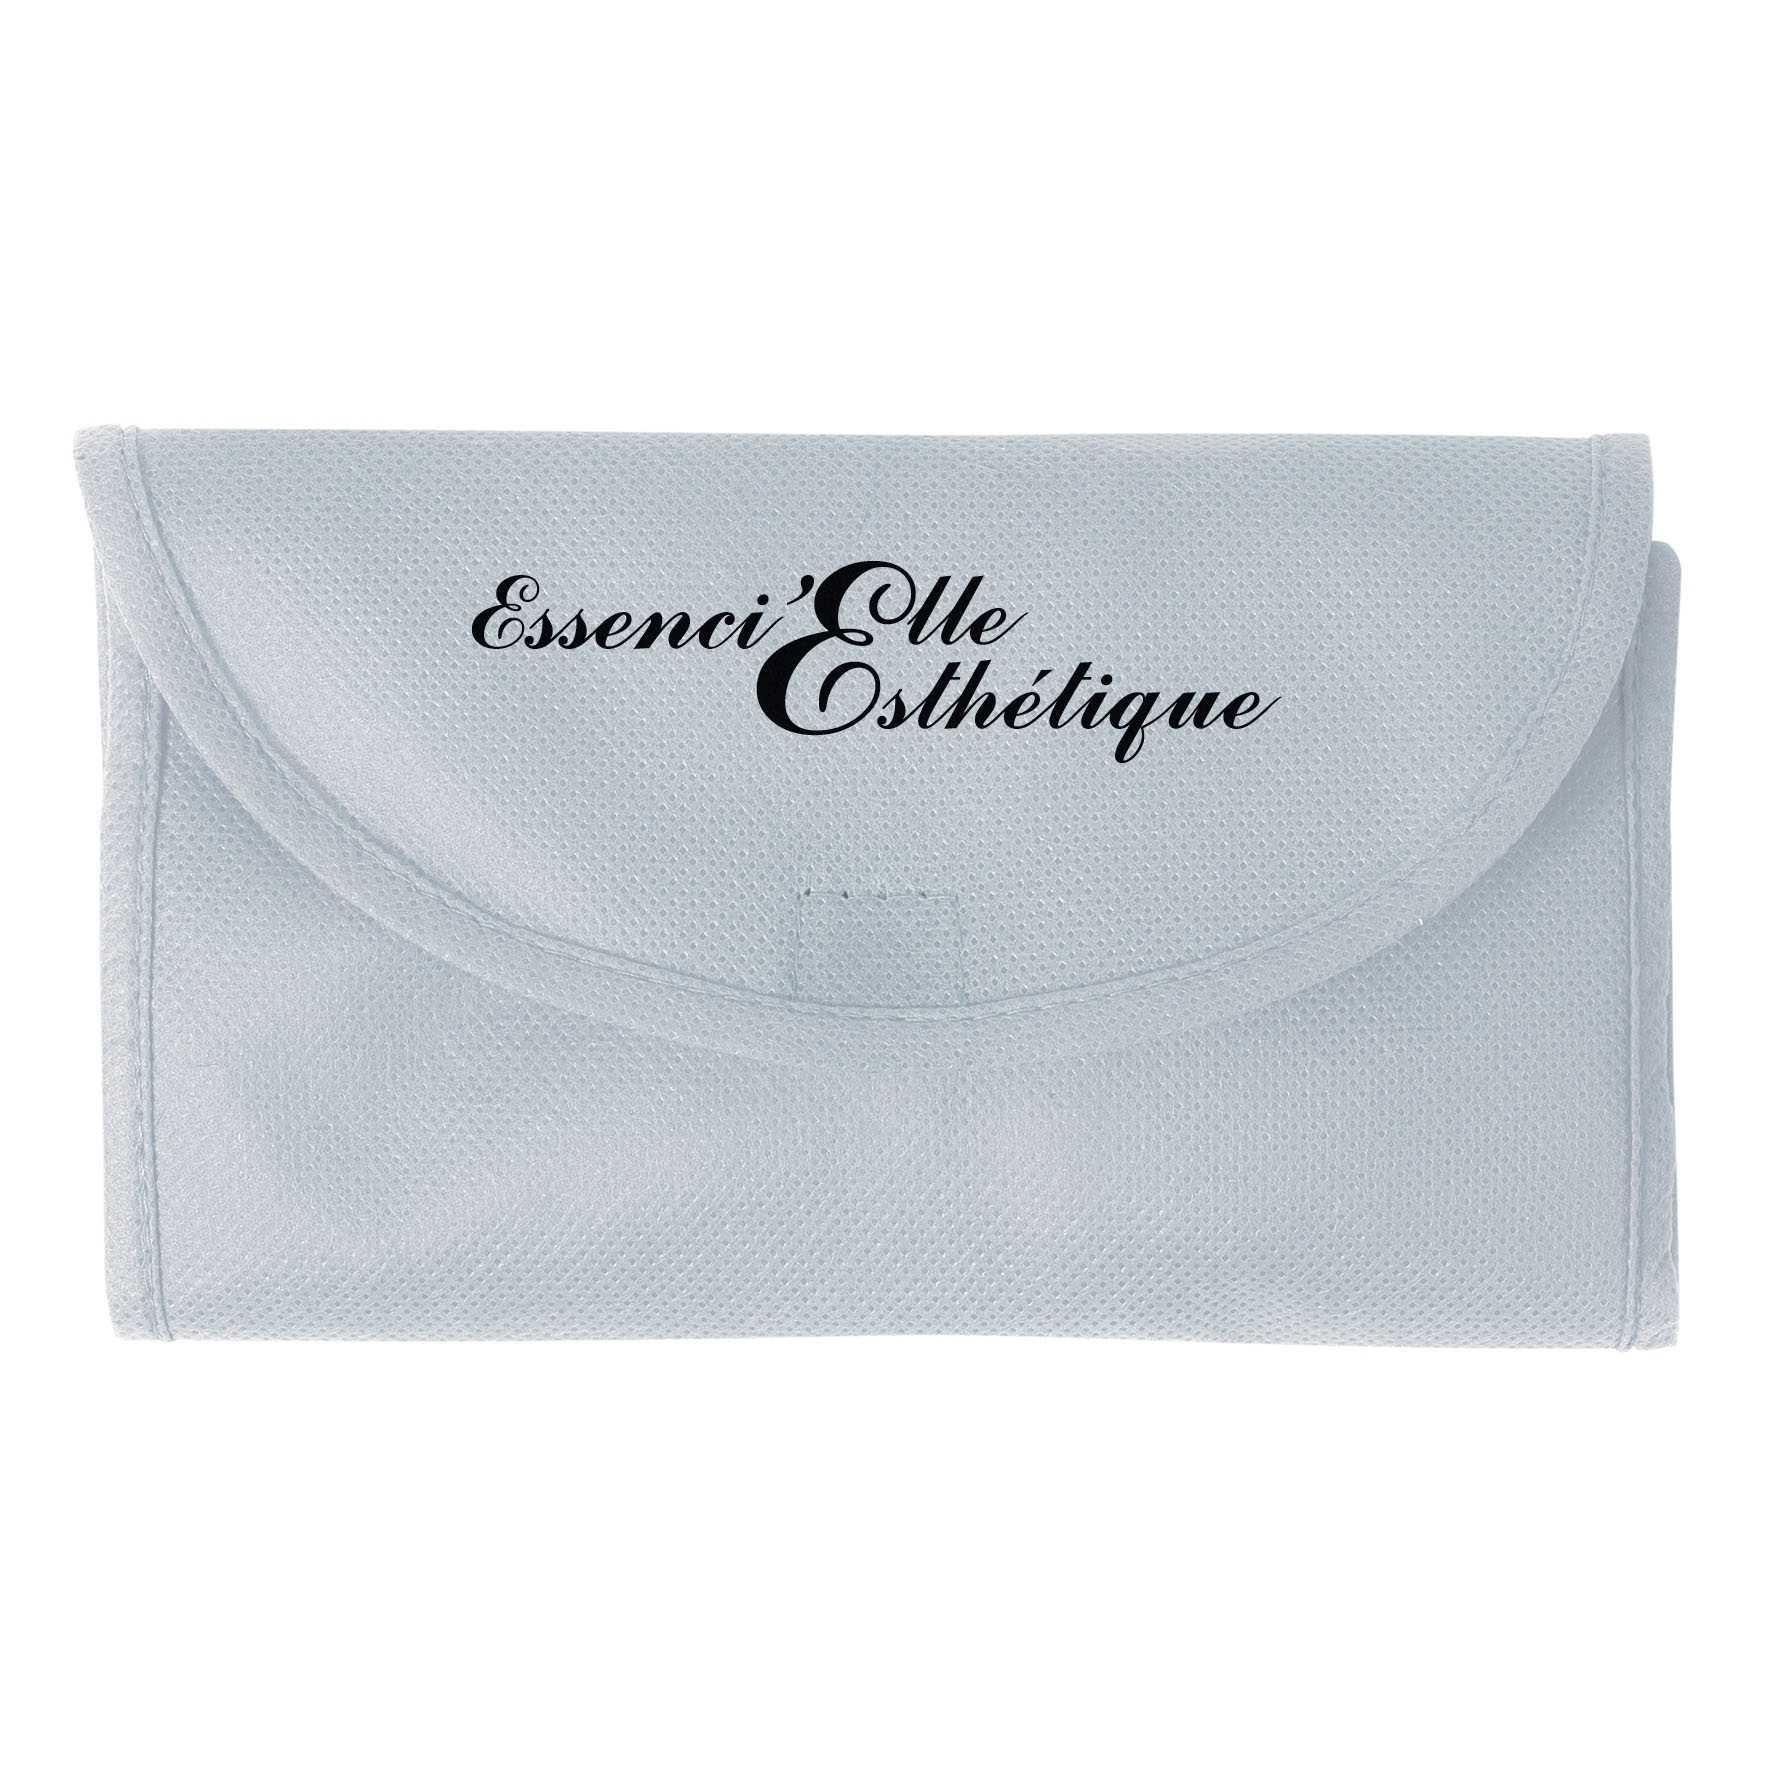 Sac shopping publicitaire pliable non tissé Pochette - sac shopping personnalisable - bleu roayl